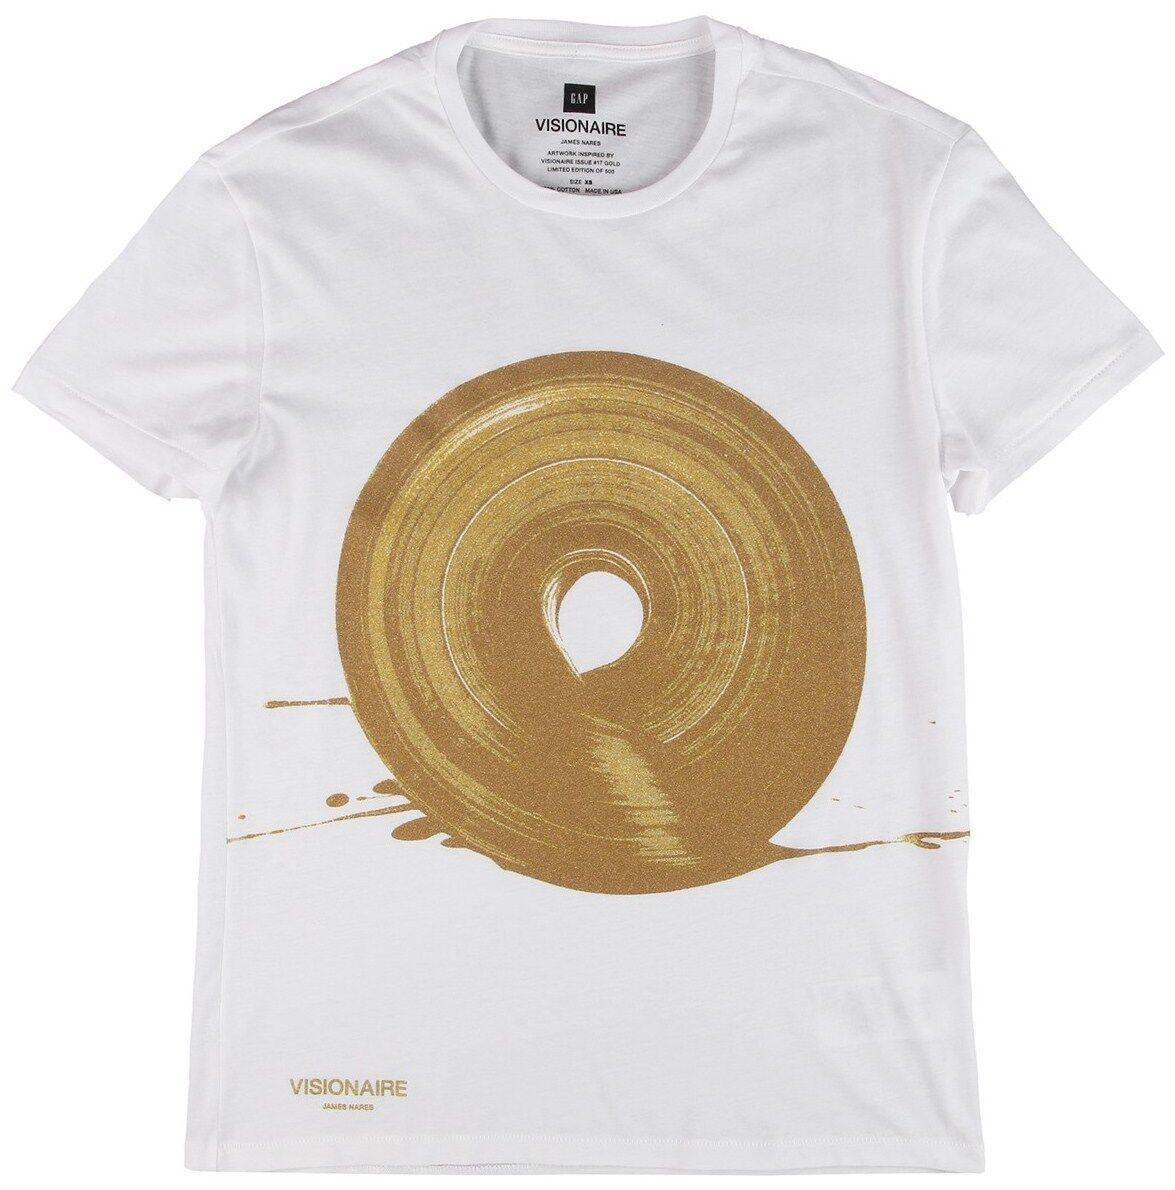 JAMES NARES x Visionaire x Gap Gold Ink Silkscreen T-Shirt M S/O Ltd. Ed. NWT